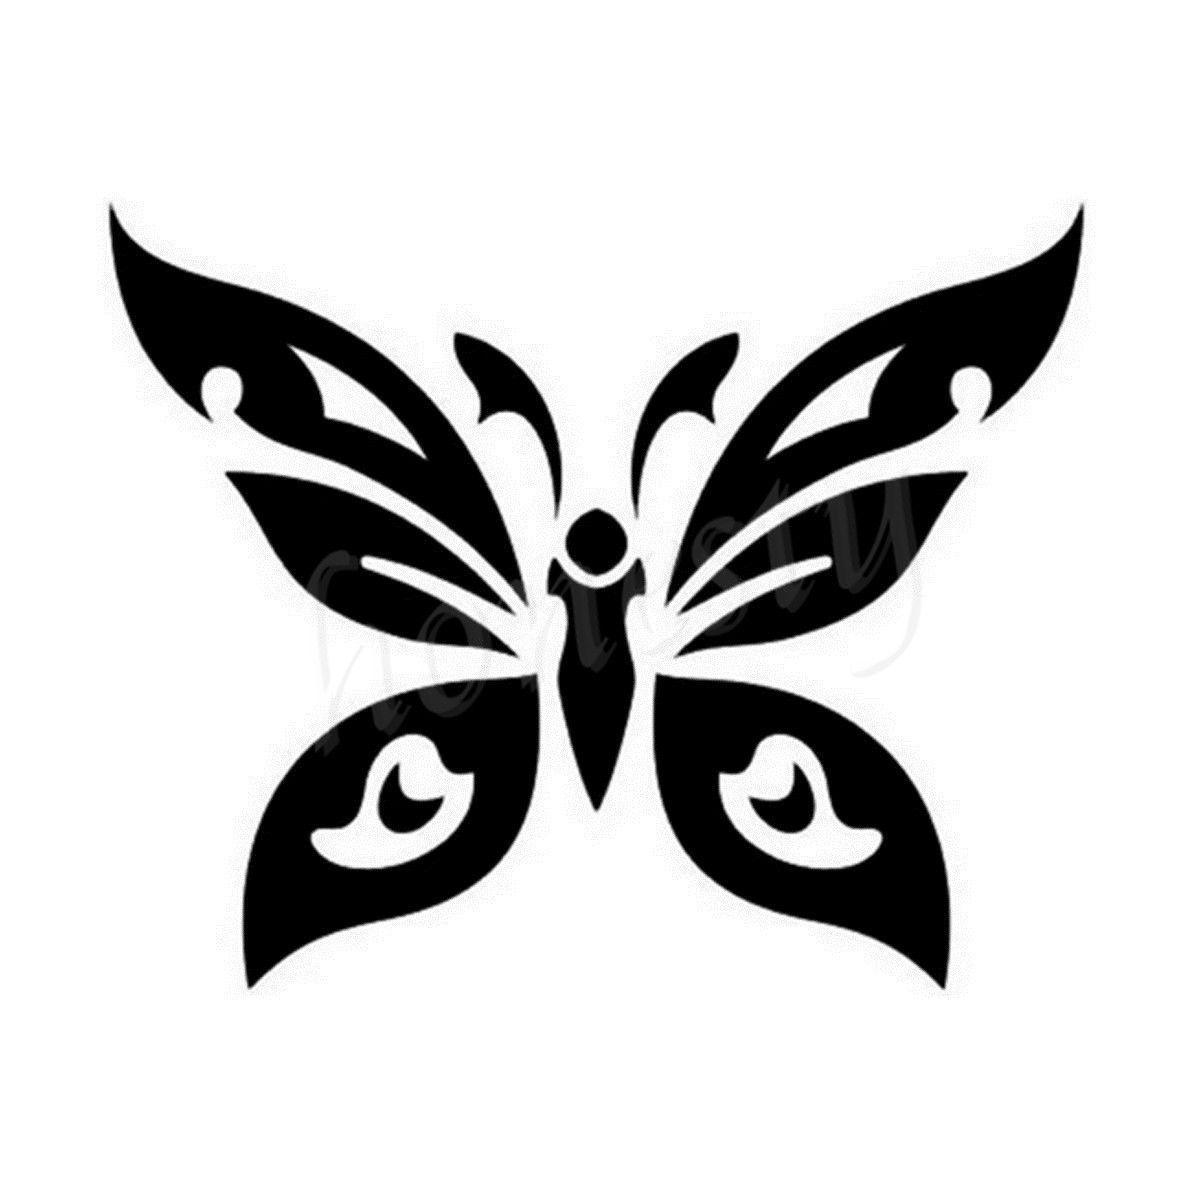 Fairy Free Tattoo Stencil Free Tattoo Designs For Women Customized Fairy Tattoos Free Fairy Tinkerbell Tattoos Free Printable Tattoo Stencils Free Printable